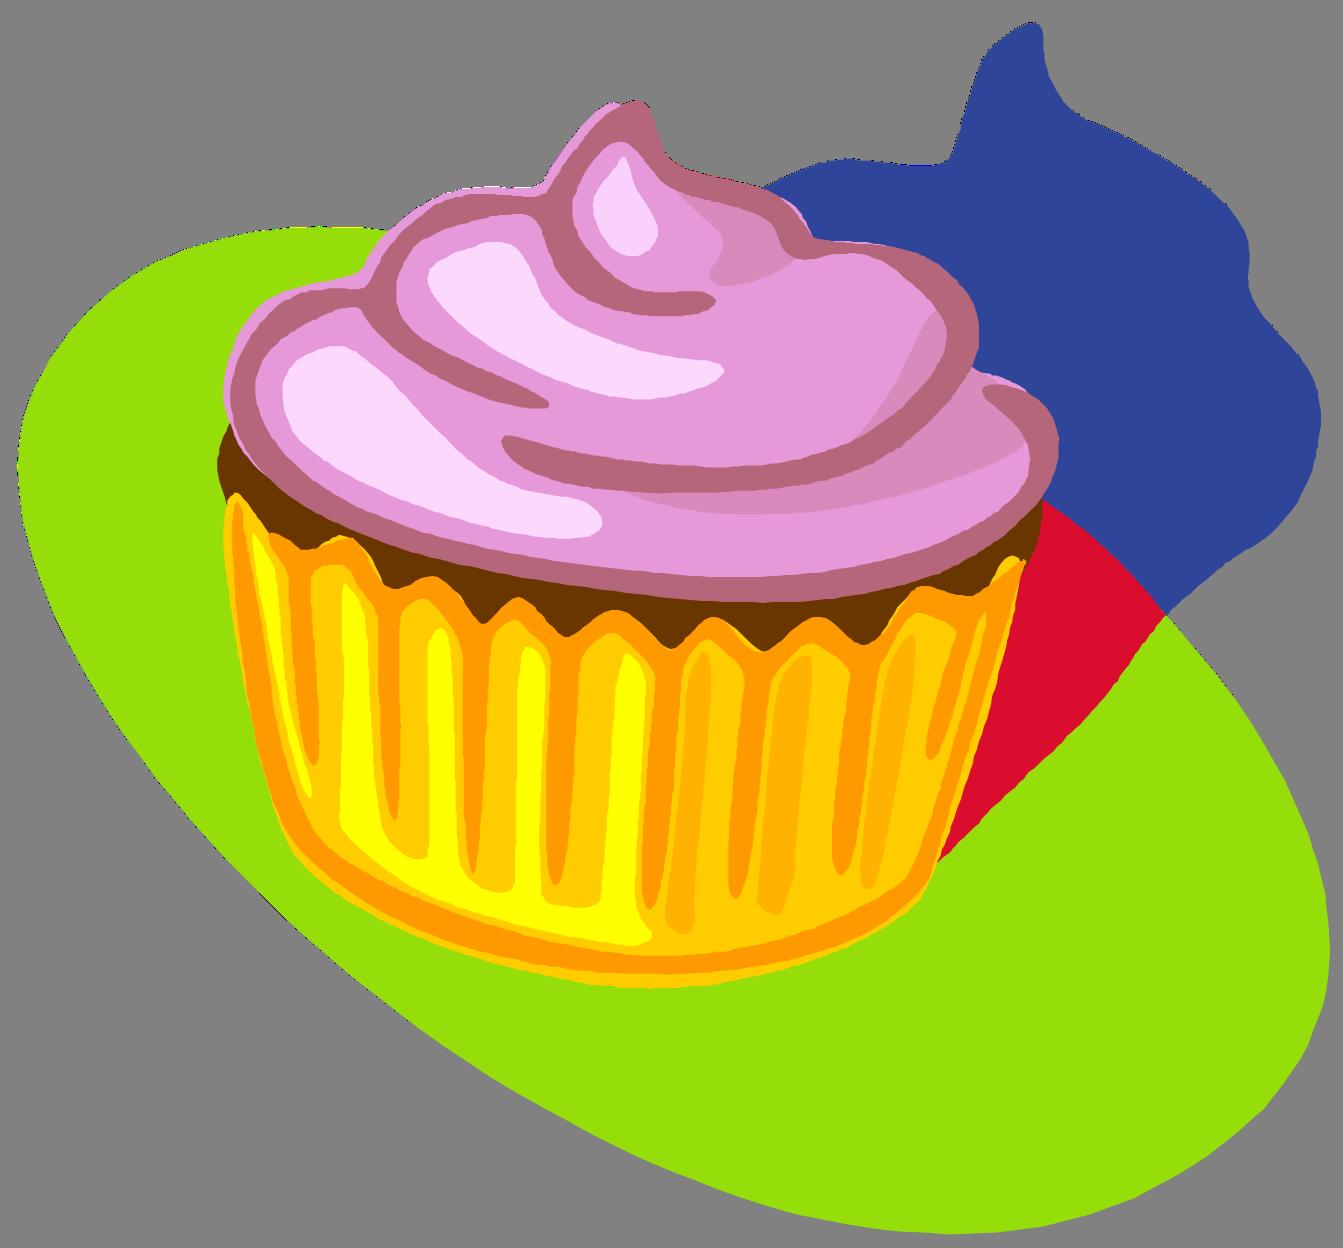 Muffin clipart april. Nanny state public secrets